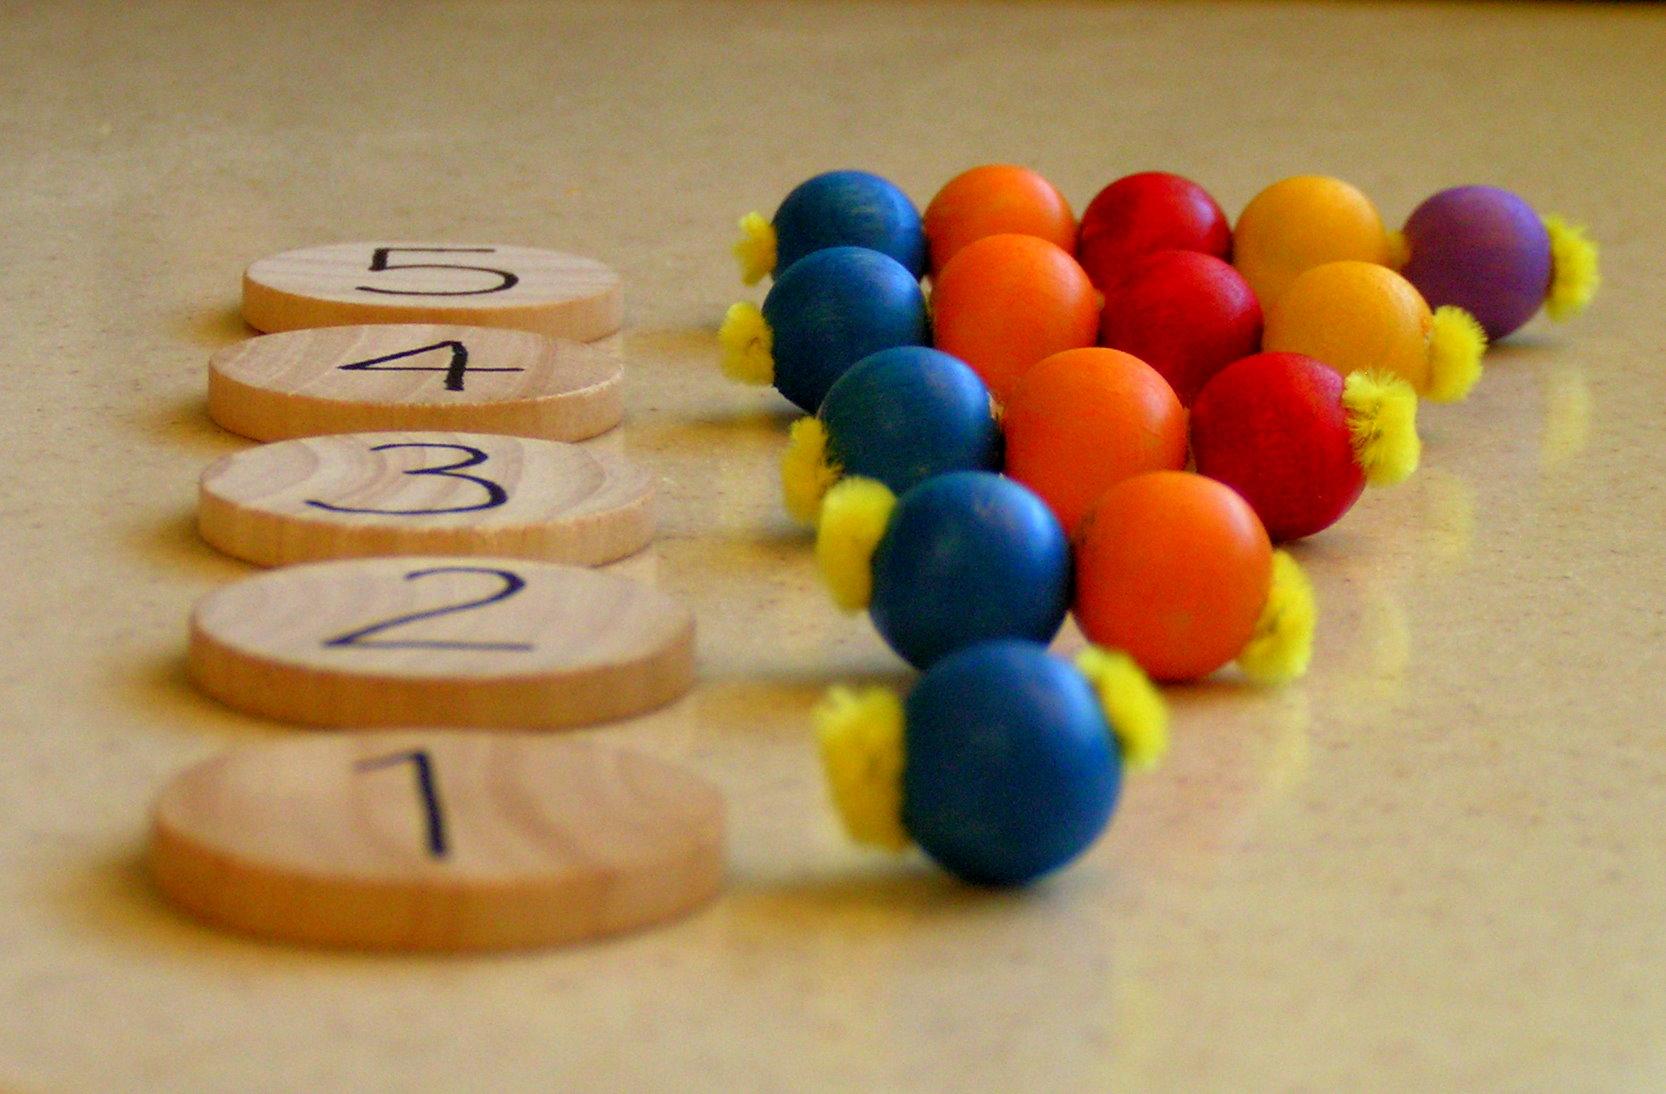 Diy And Free Printable Montessori Math Materials